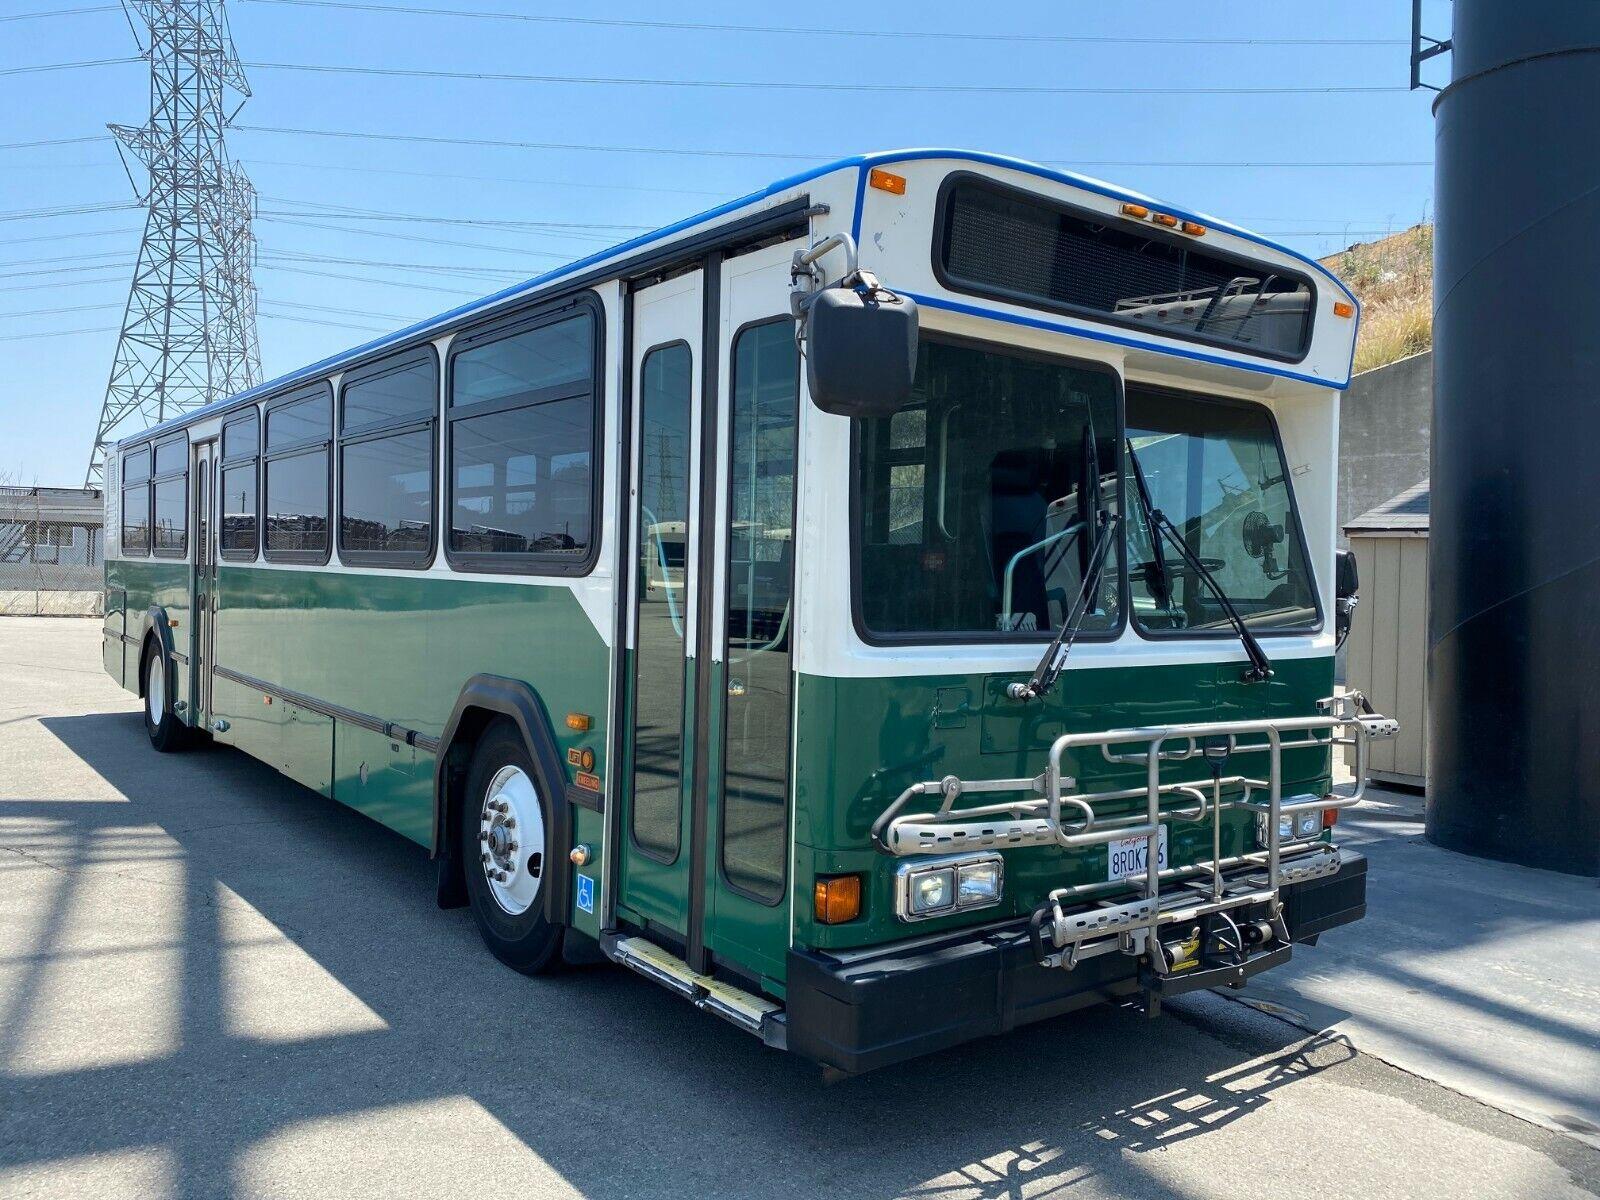 2007 Gillig Phantom 40 foot suburban transit bus - Cummins ISL/Allison B400R